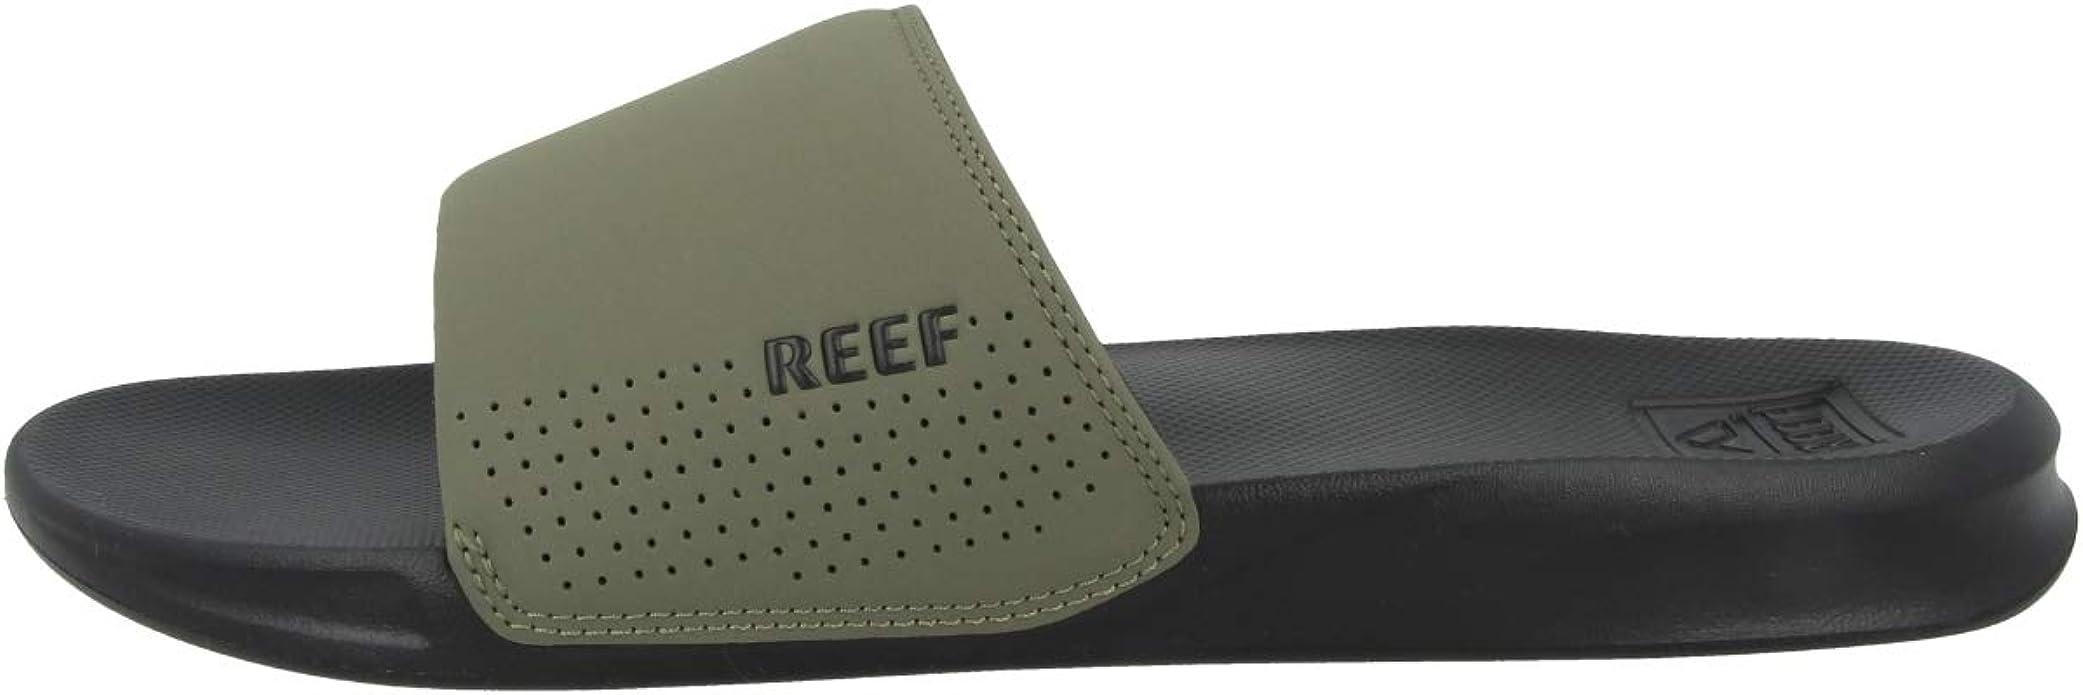 Reef One Slide Sandale Glissante Femme